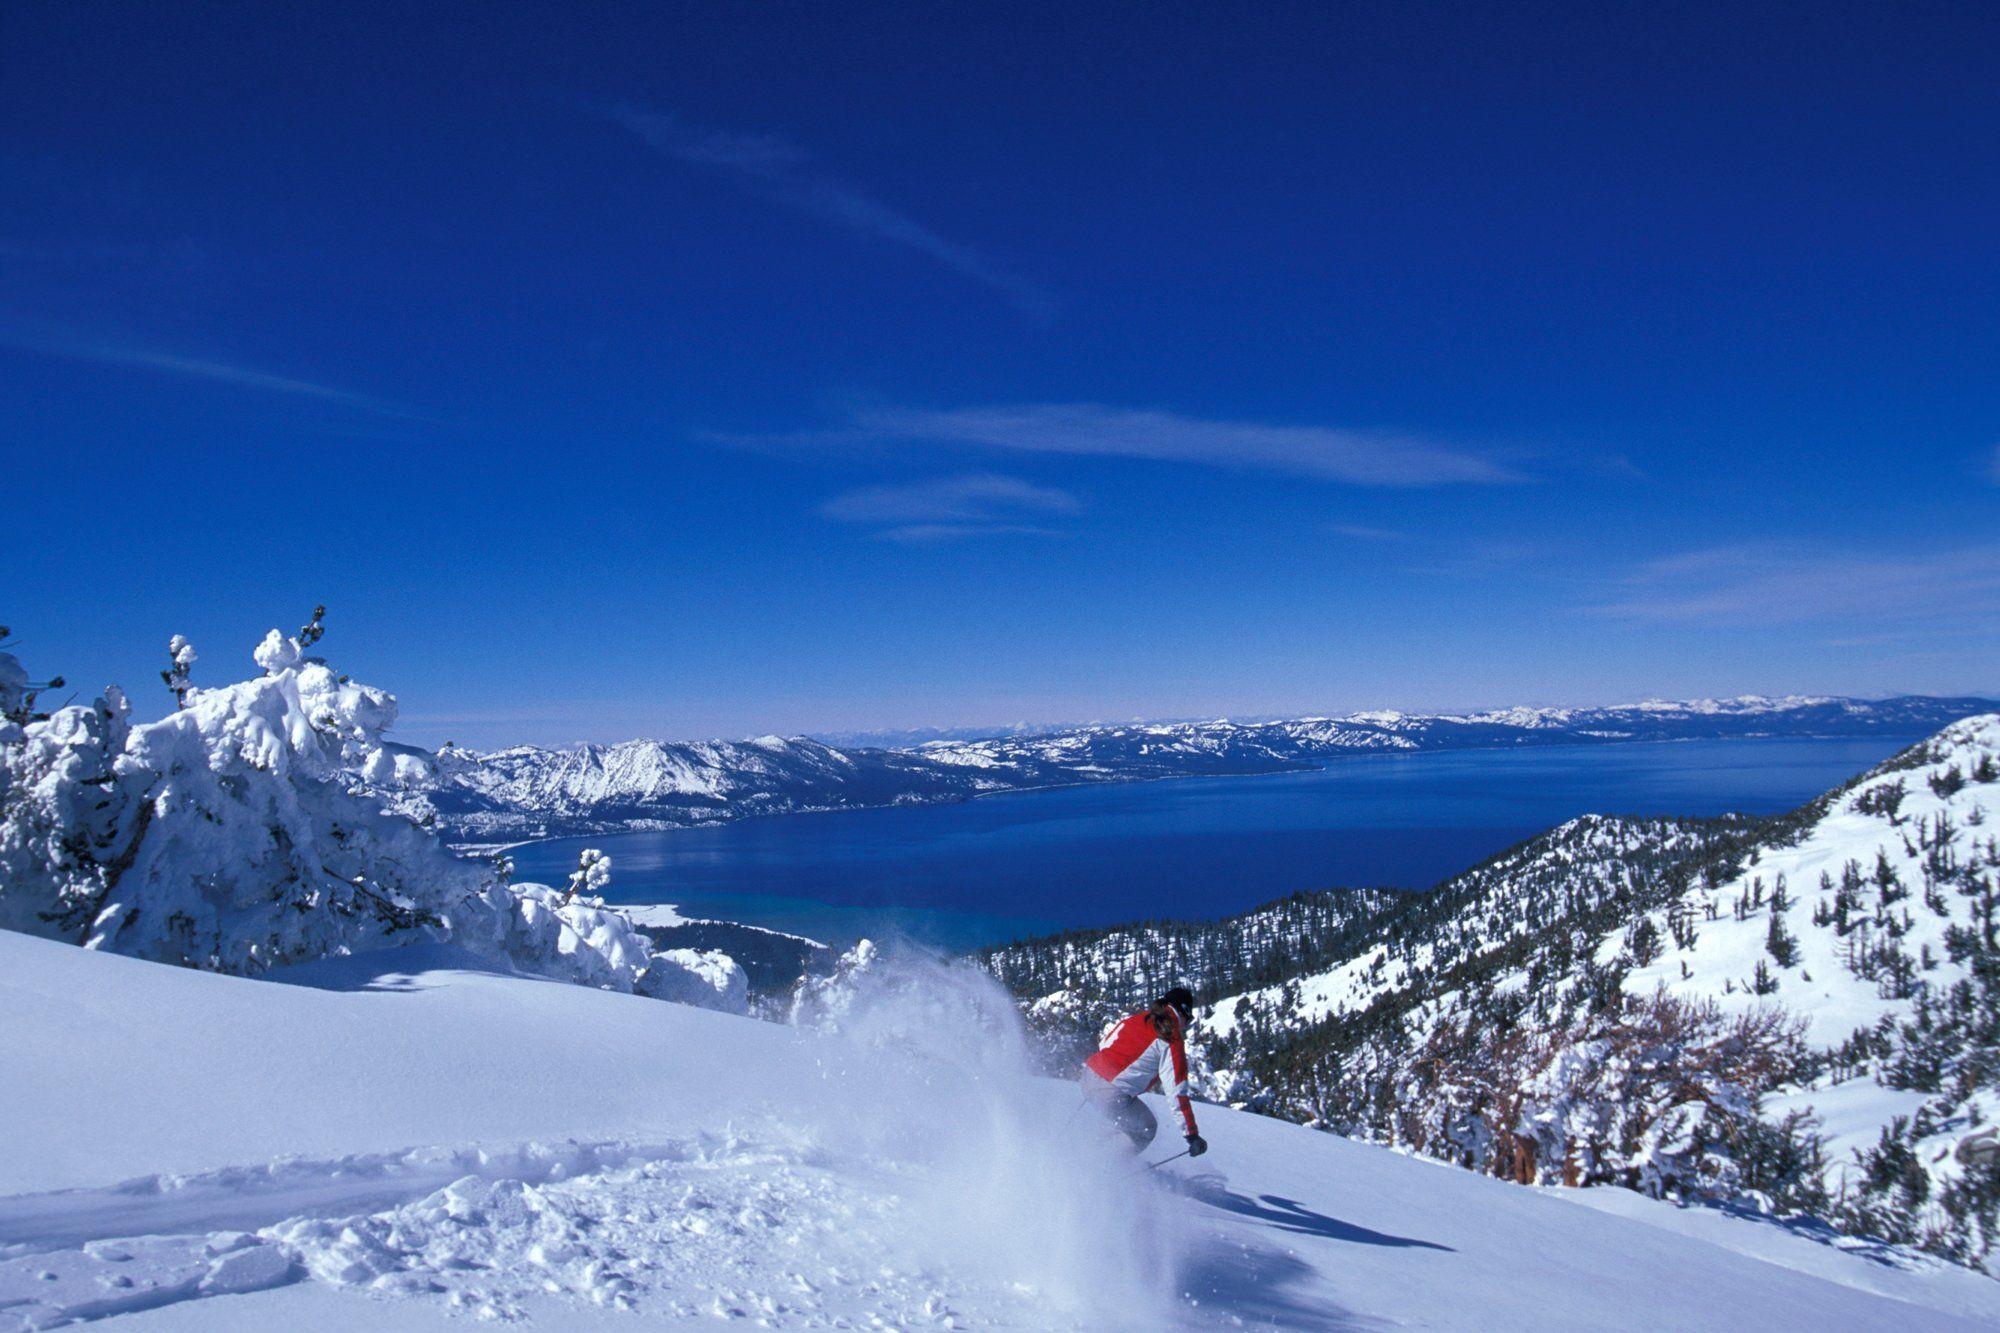 heavenly ski resort south lake tahoe | south lake tahoe hotels